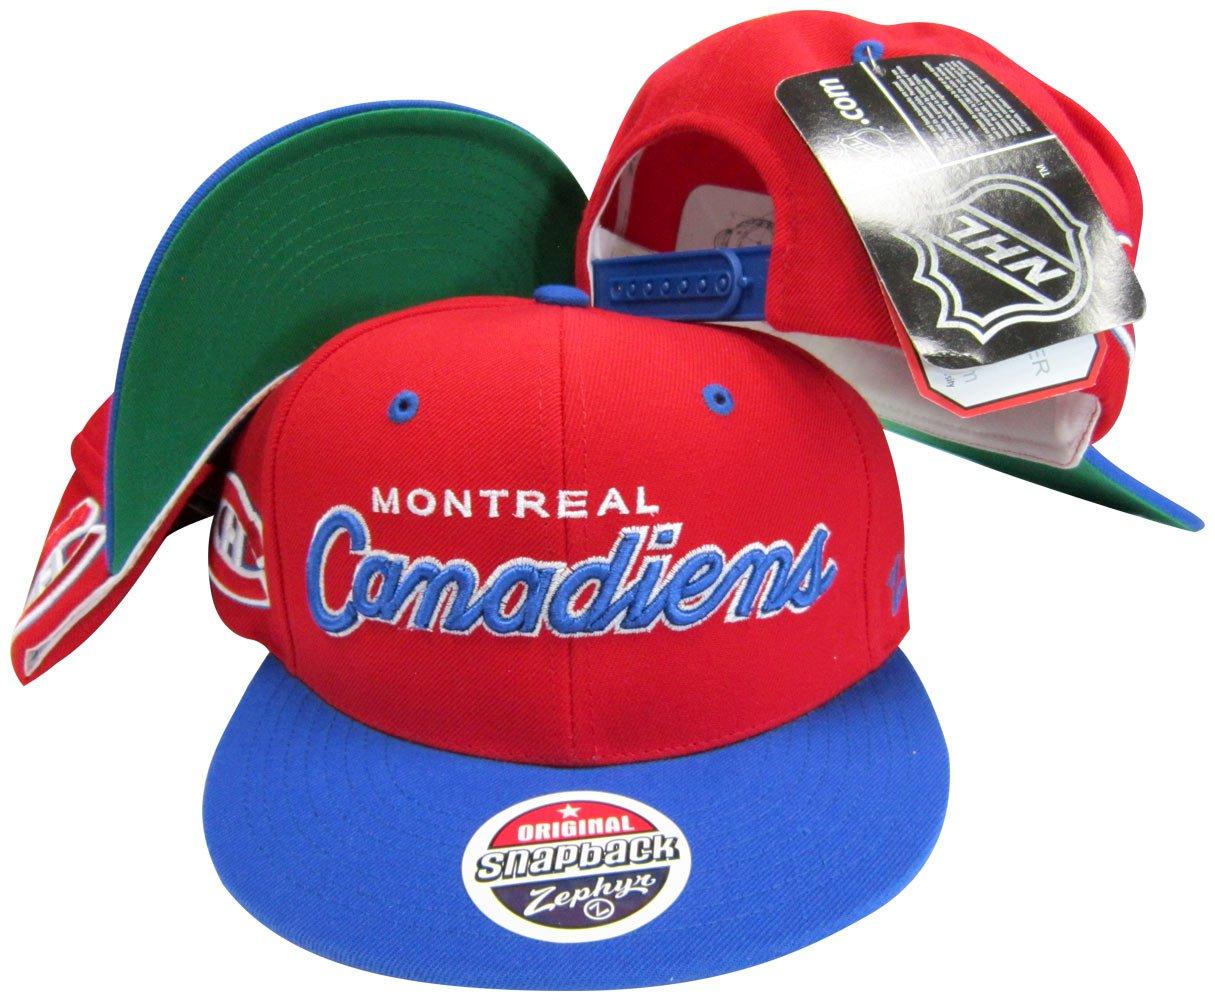 ZHATS Washington Capitals Script White//Blue Two Tone Plastic Snapback Adjustable Plastic Snap Back Hat//Cap